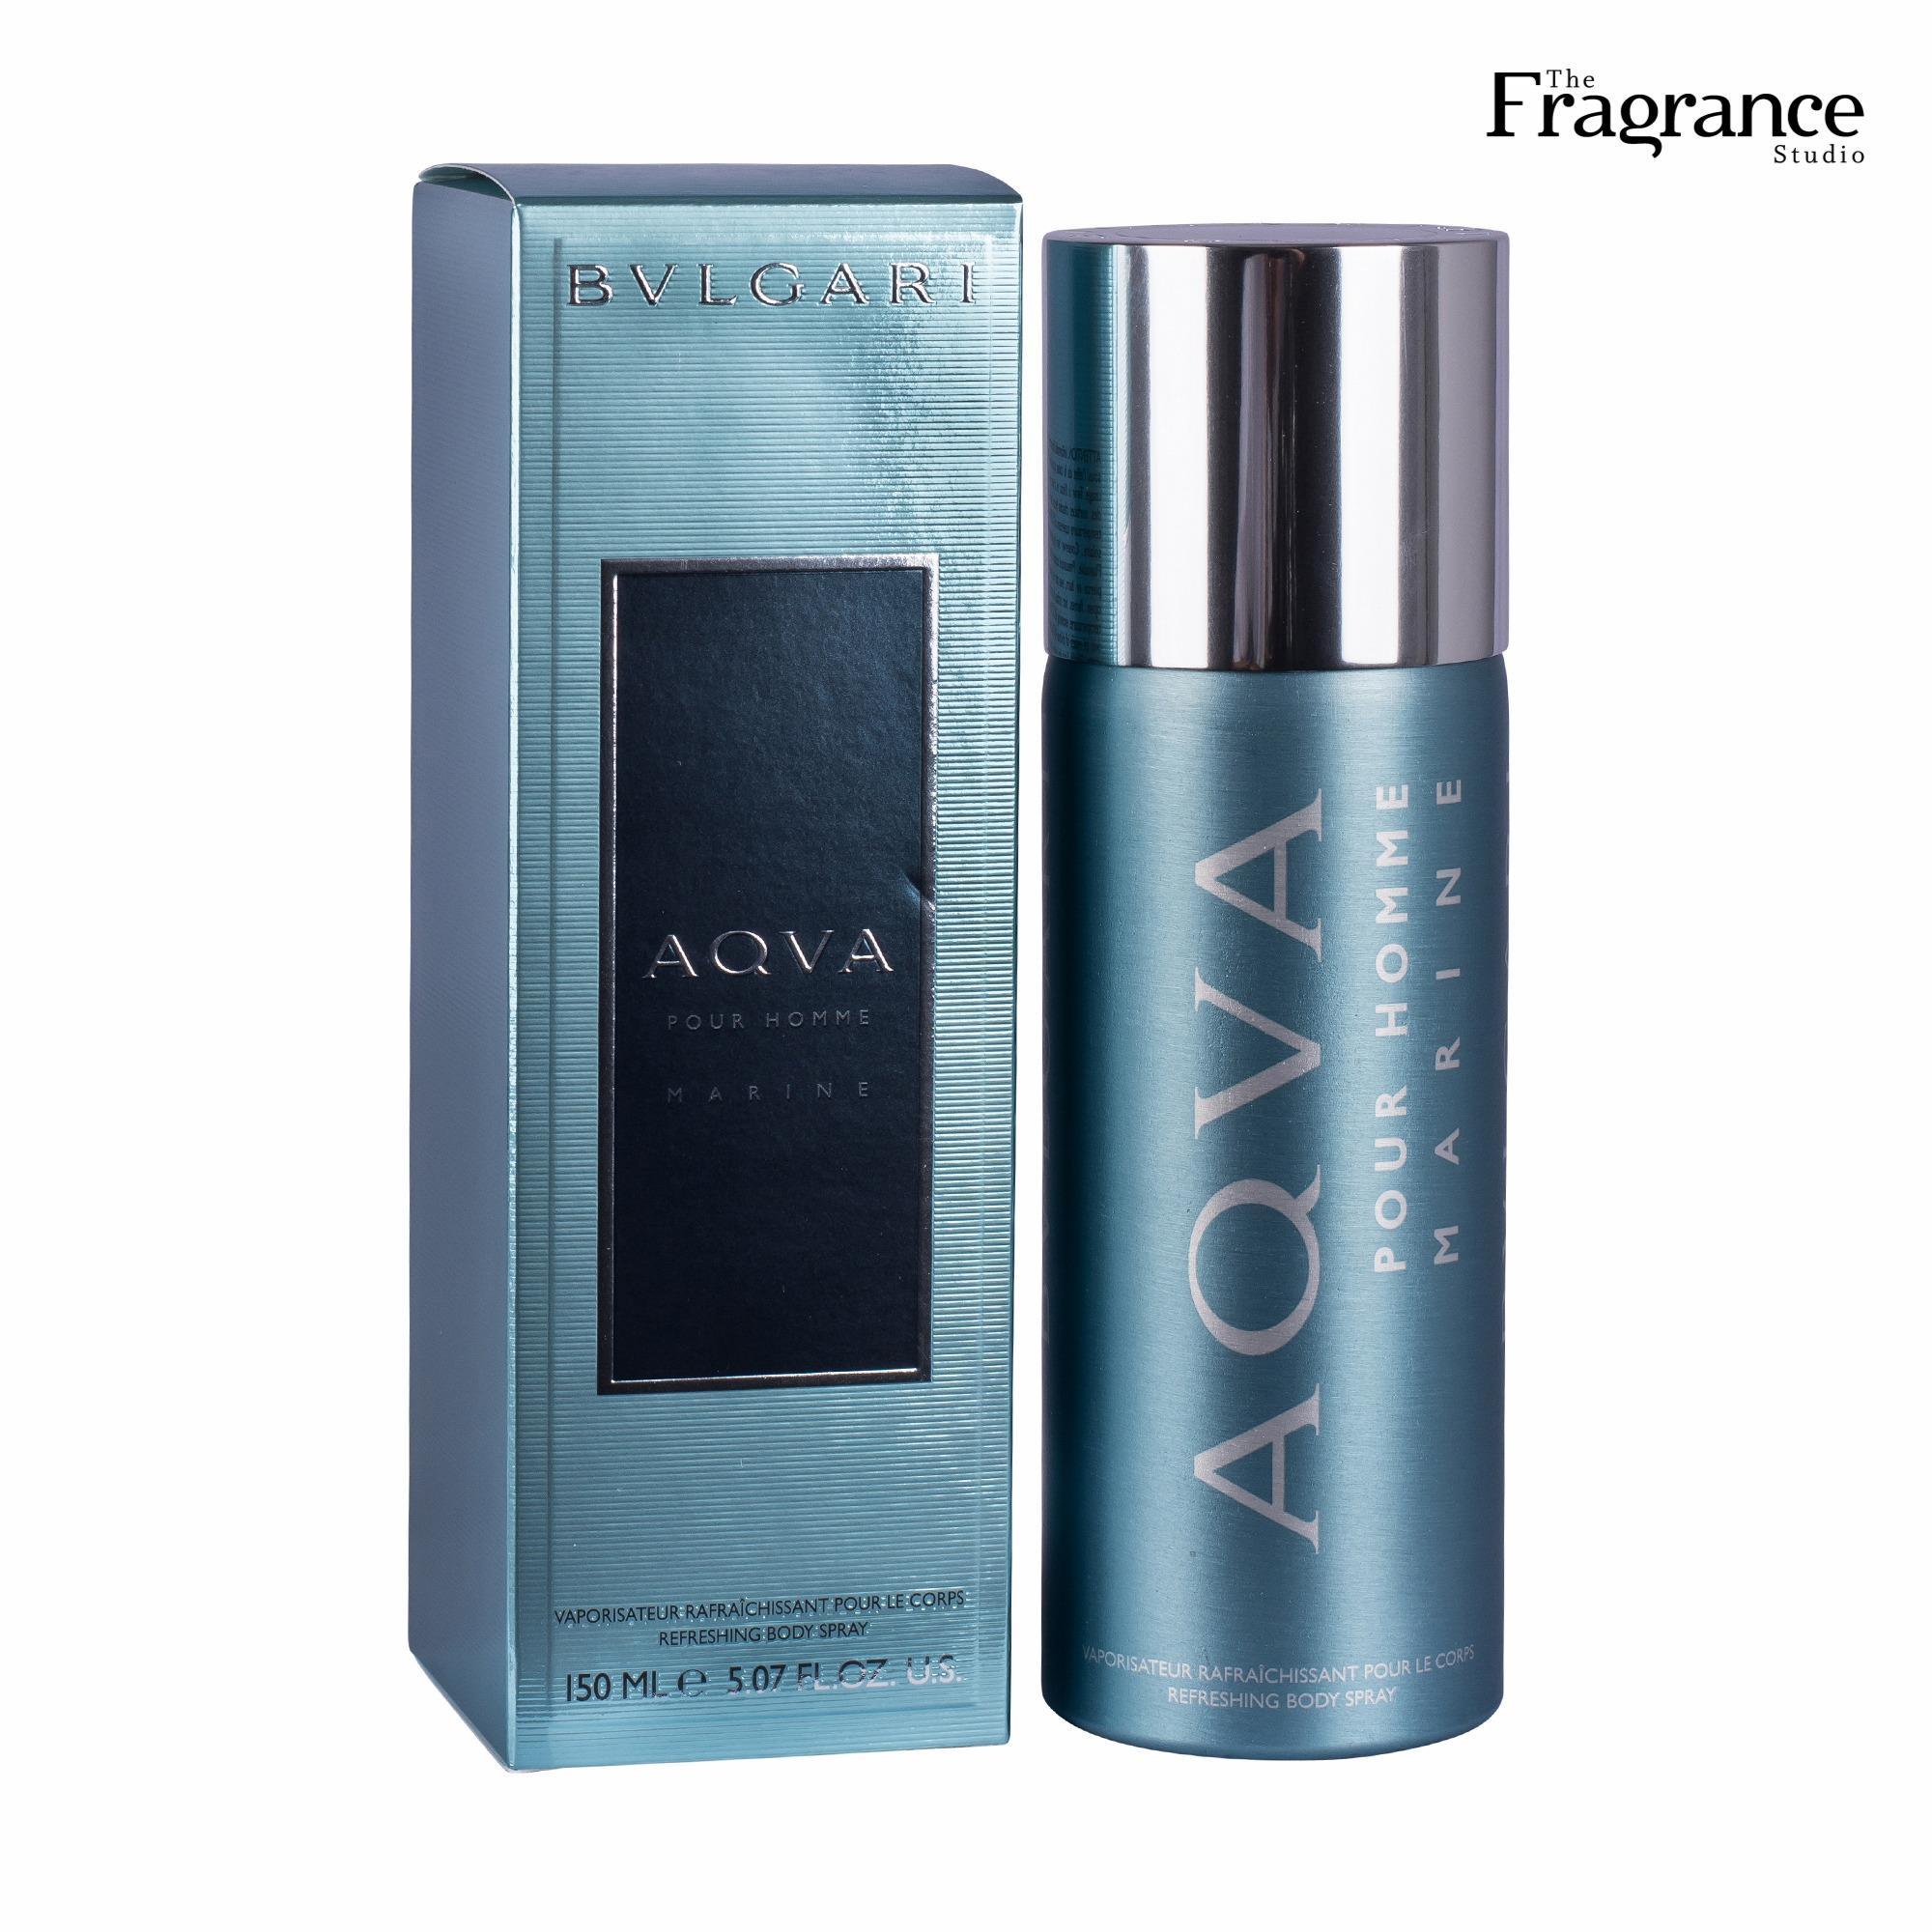 Buy Bvlgari Fragrance Eau De Toilette Lazada Bvgari Parfume